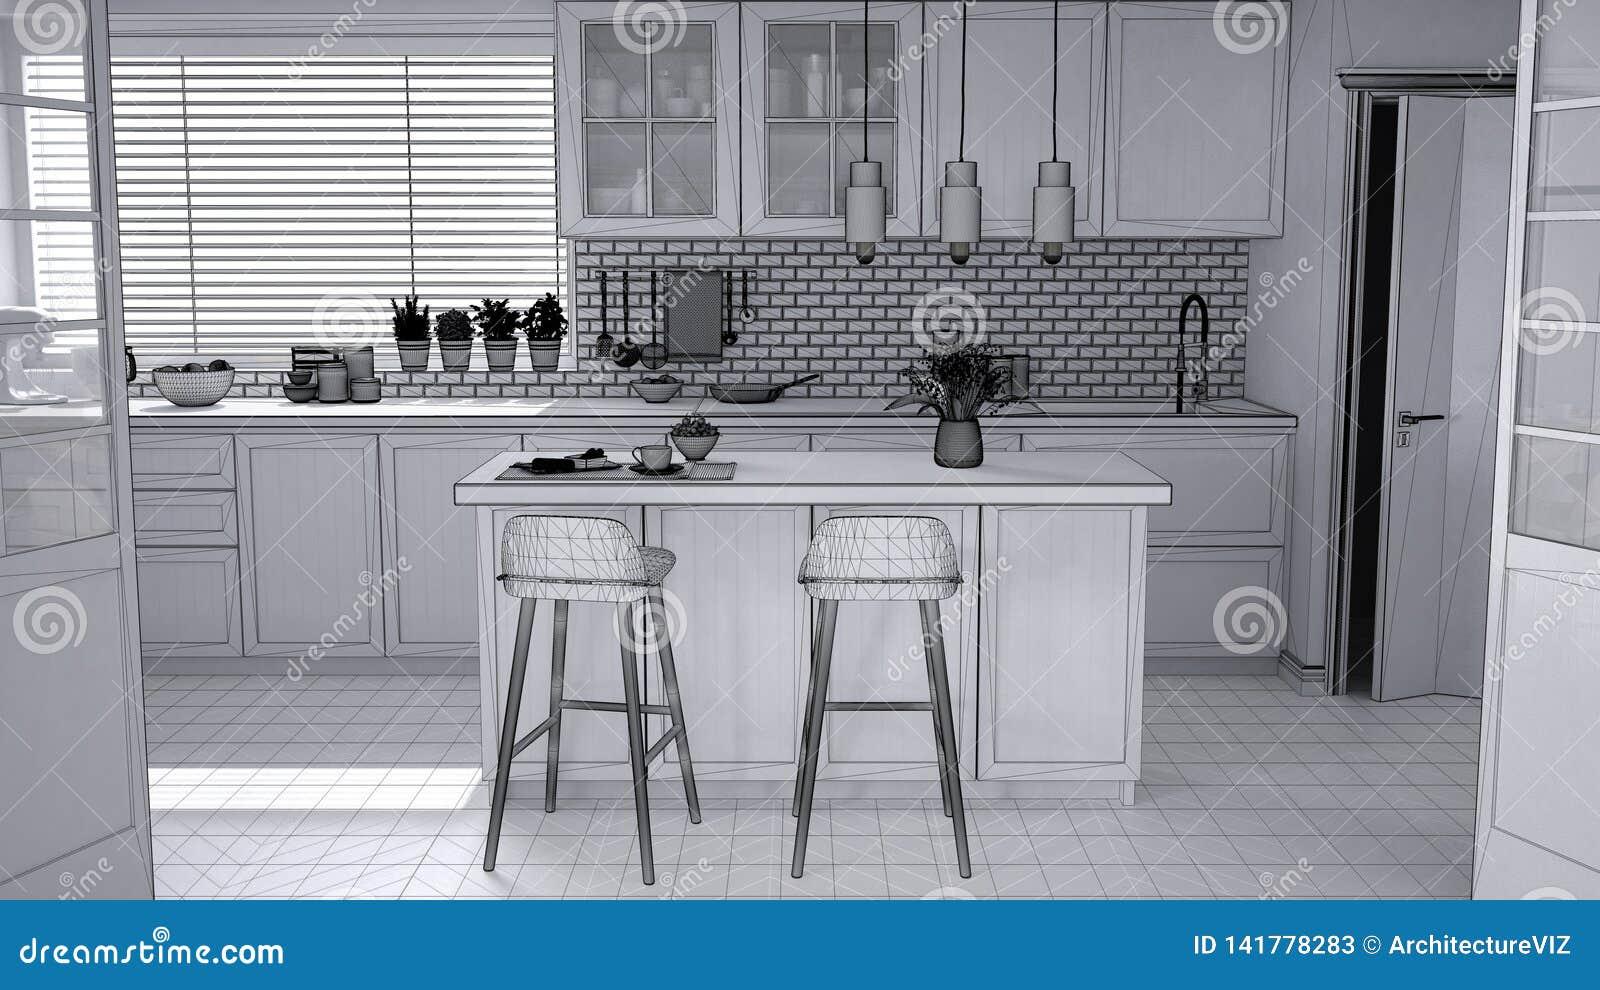 Unfinished Project Draft Of Modern Scandinavian Kitchen